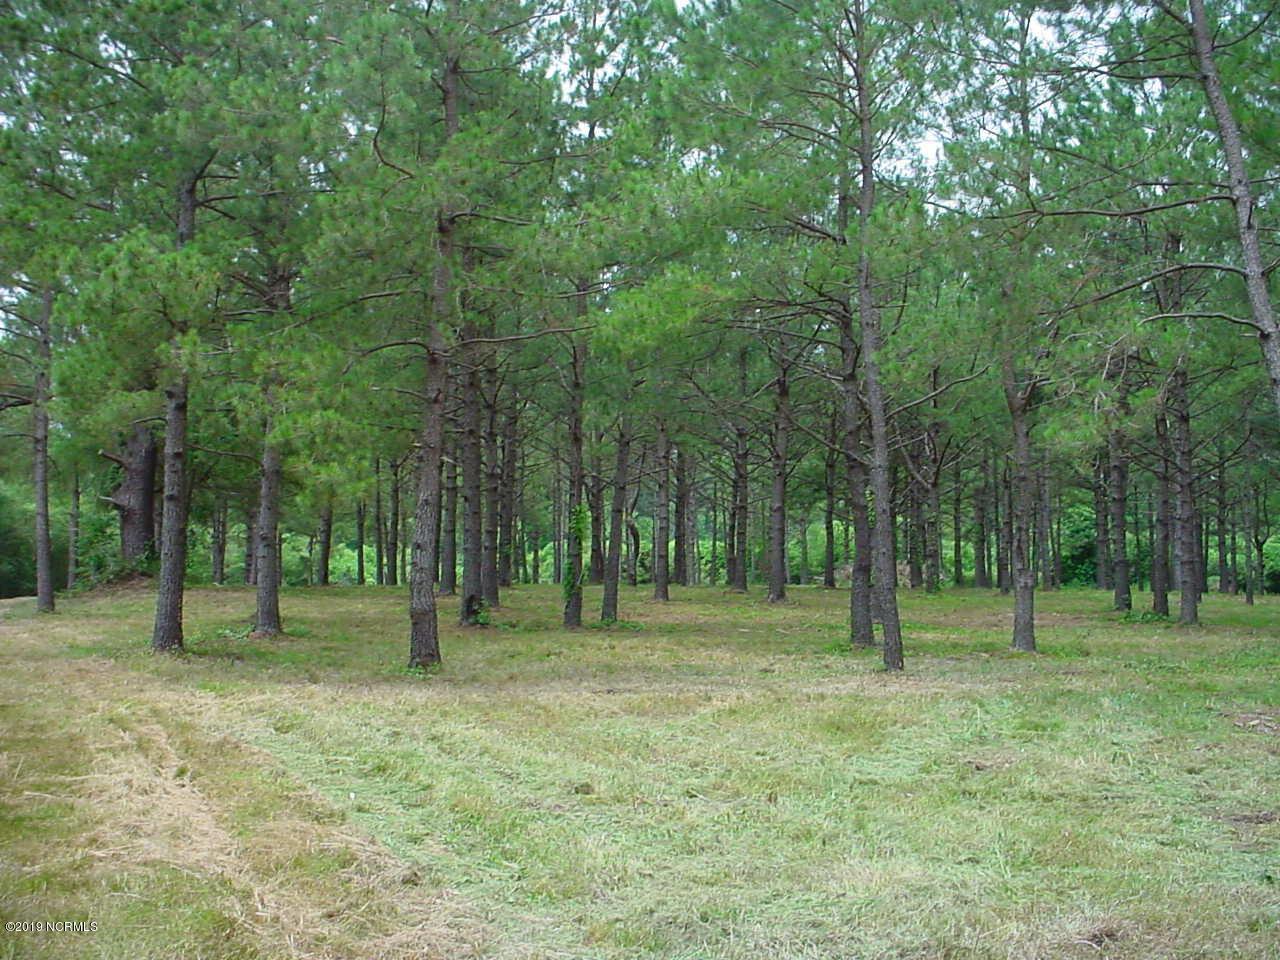 0 Harts Lane, Rocky Point, North Carolina 28457, ,Undeveloped,For sale,Harts,100173328